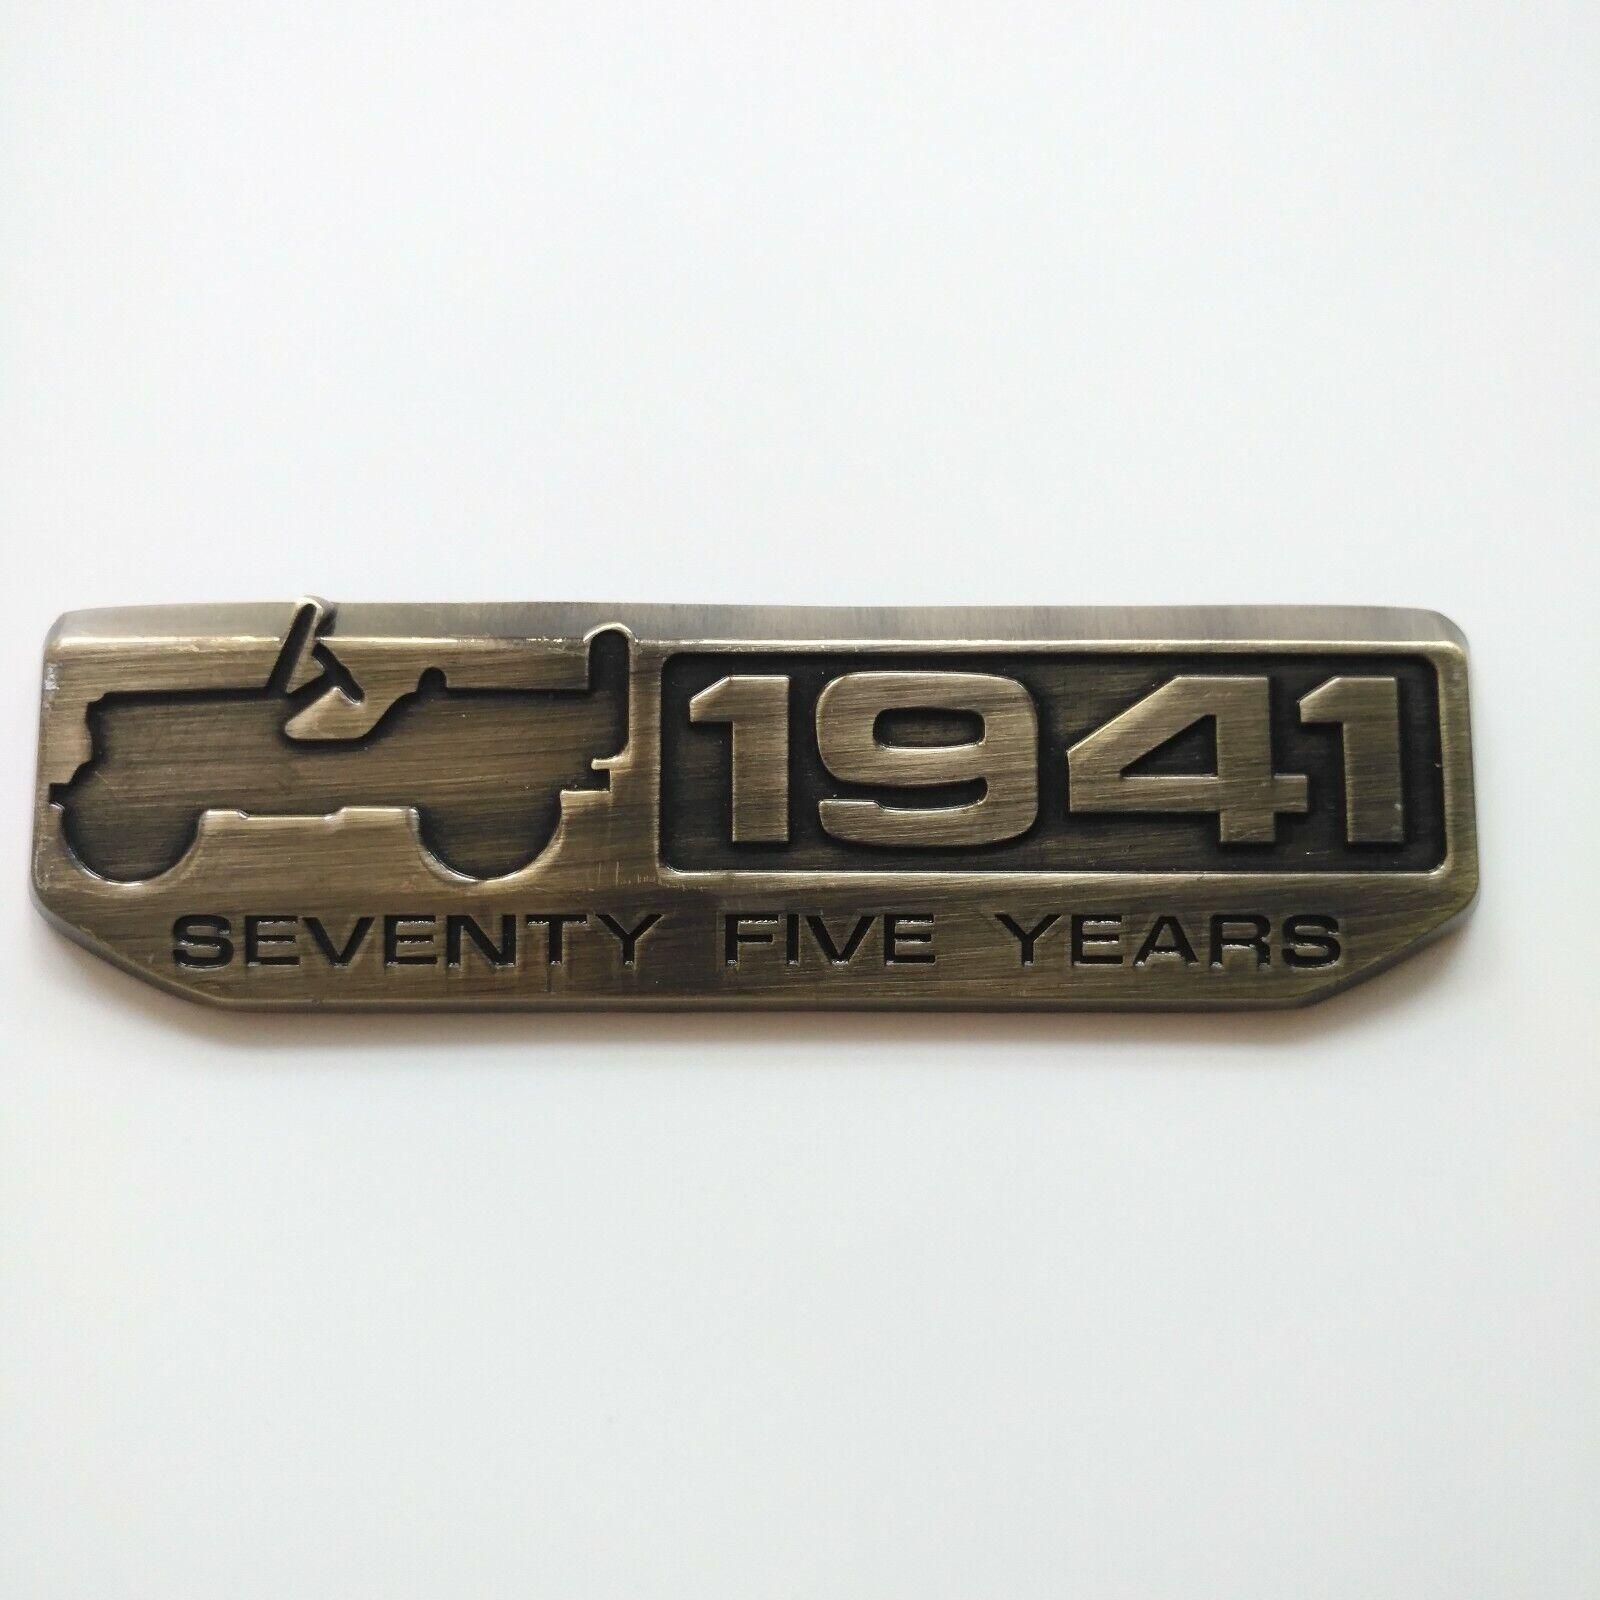 75th Anniversary 1941 Metal Car Emblem Badge for Jeep Wrangler Cherokee Willys